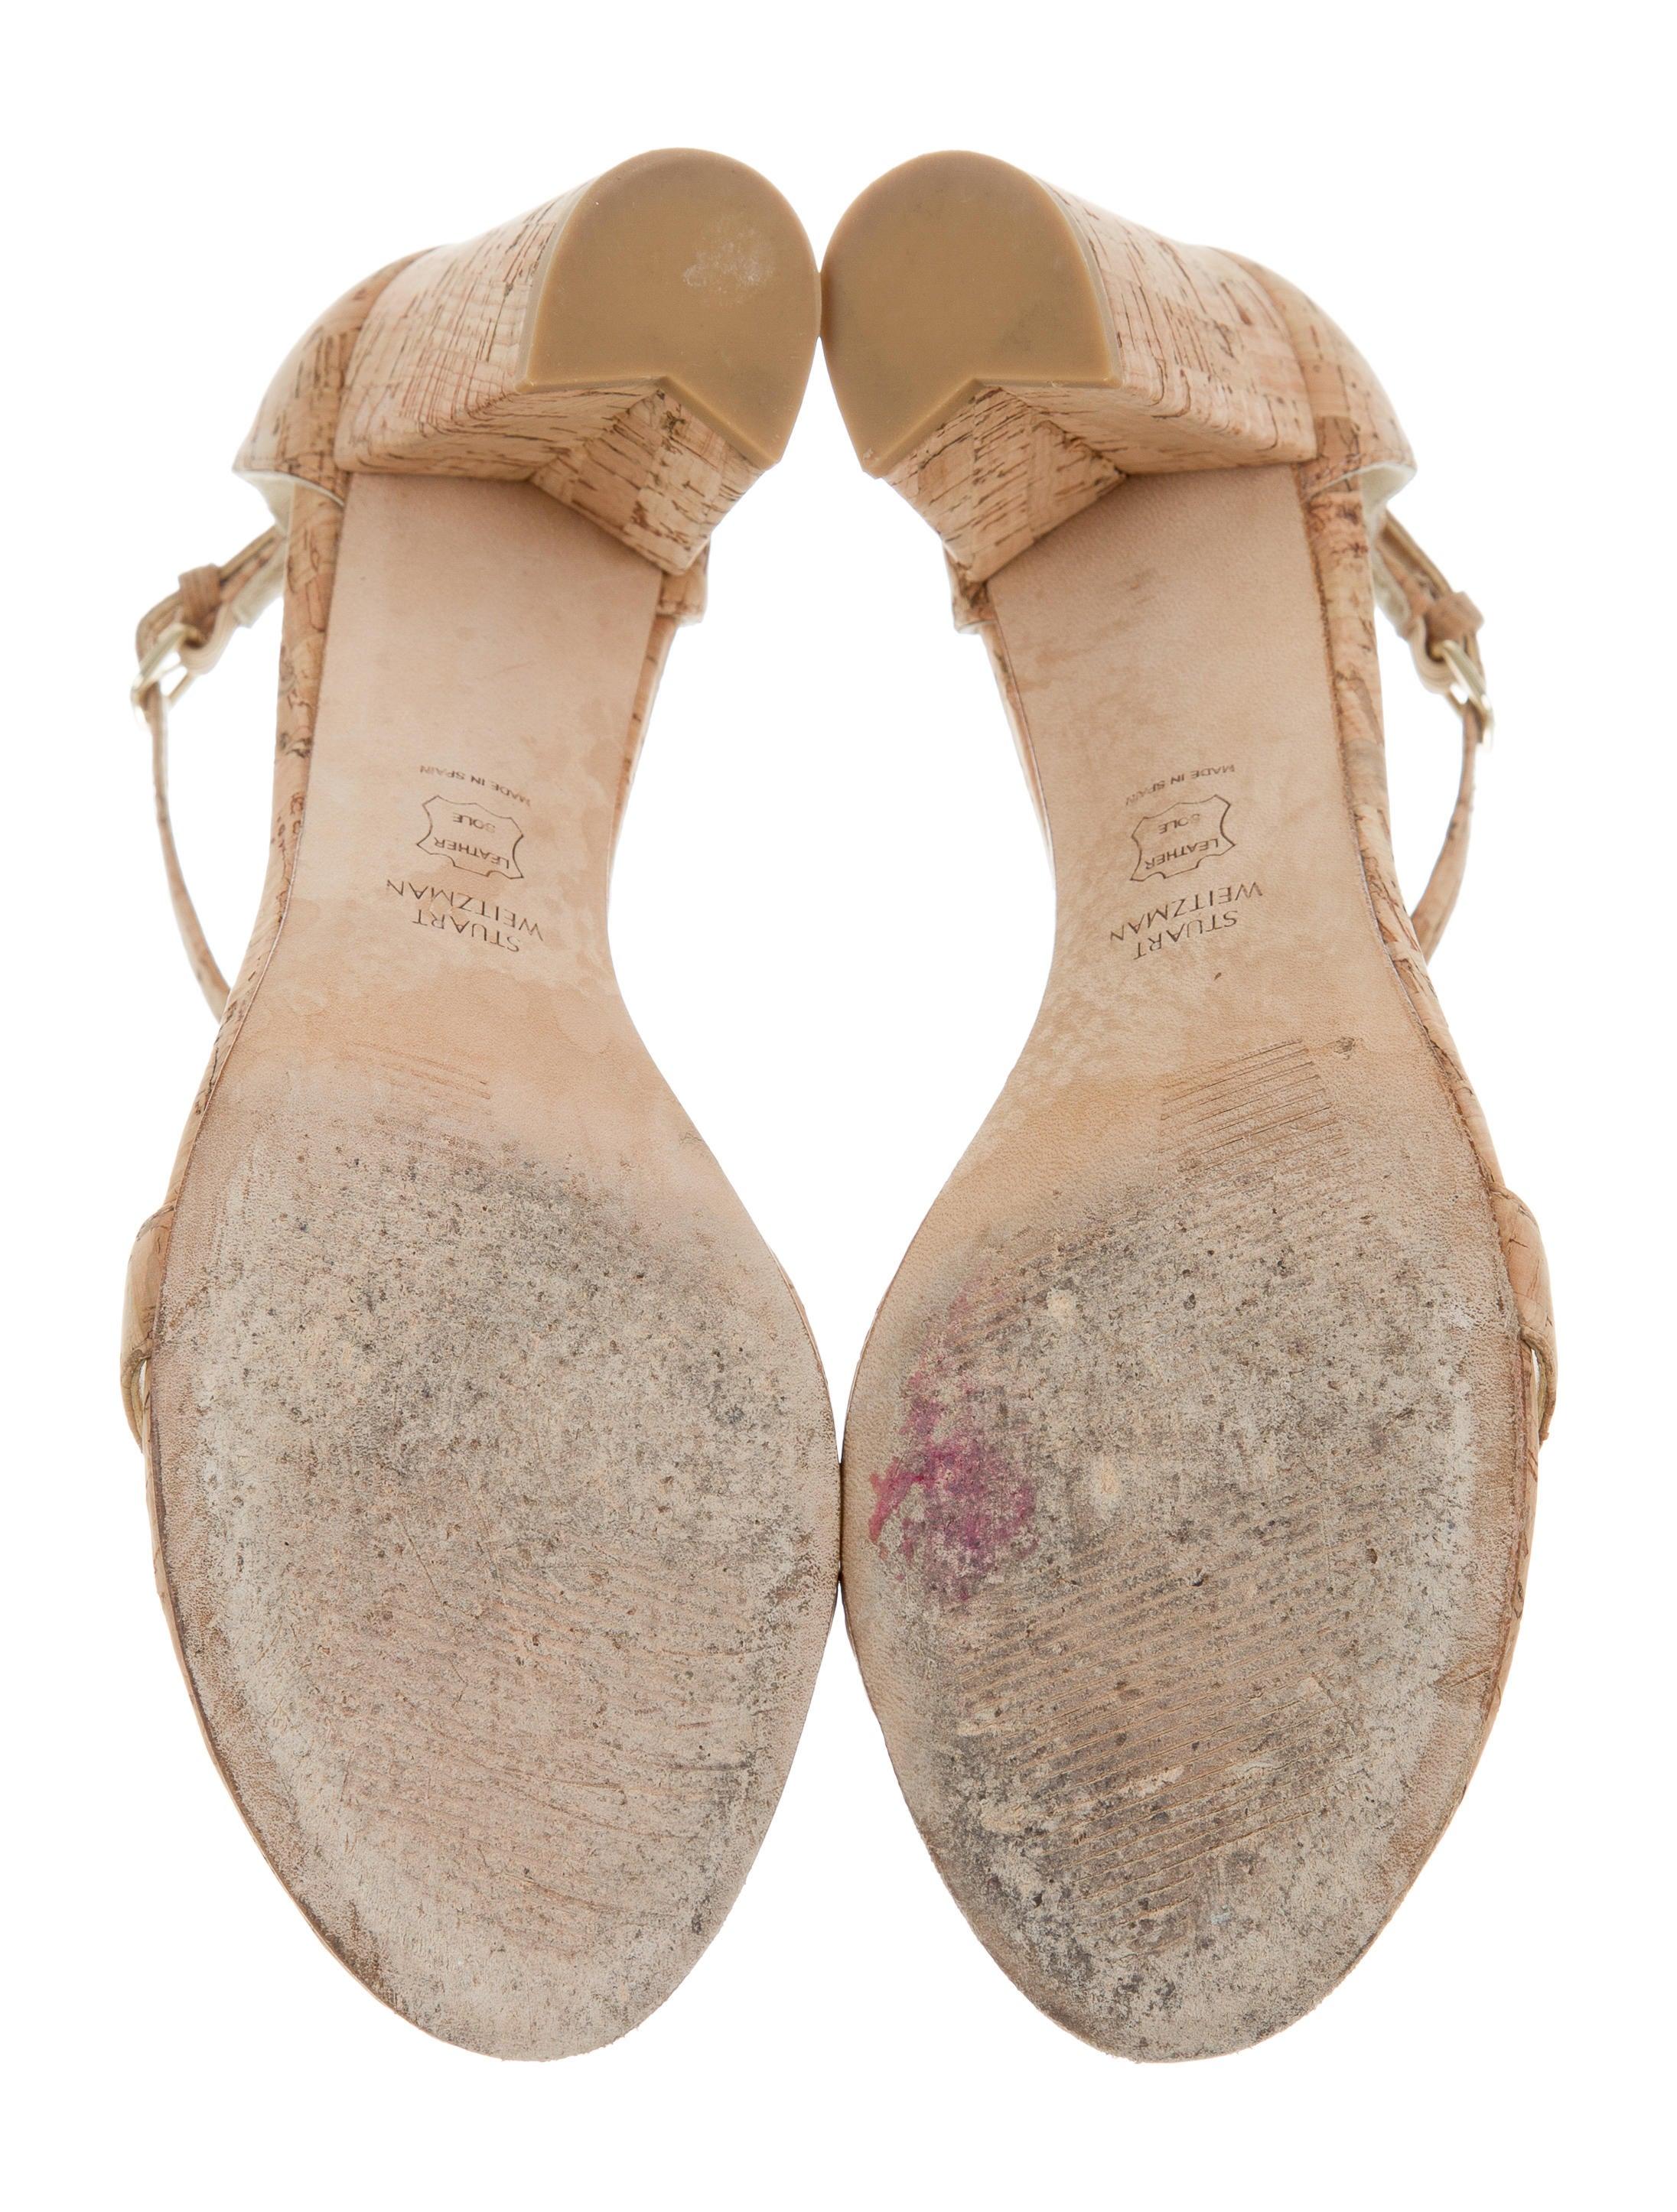 Stuart Weitzman Nearly Nude Sandals - Shoes - Wsu30754  The Realreal-9051